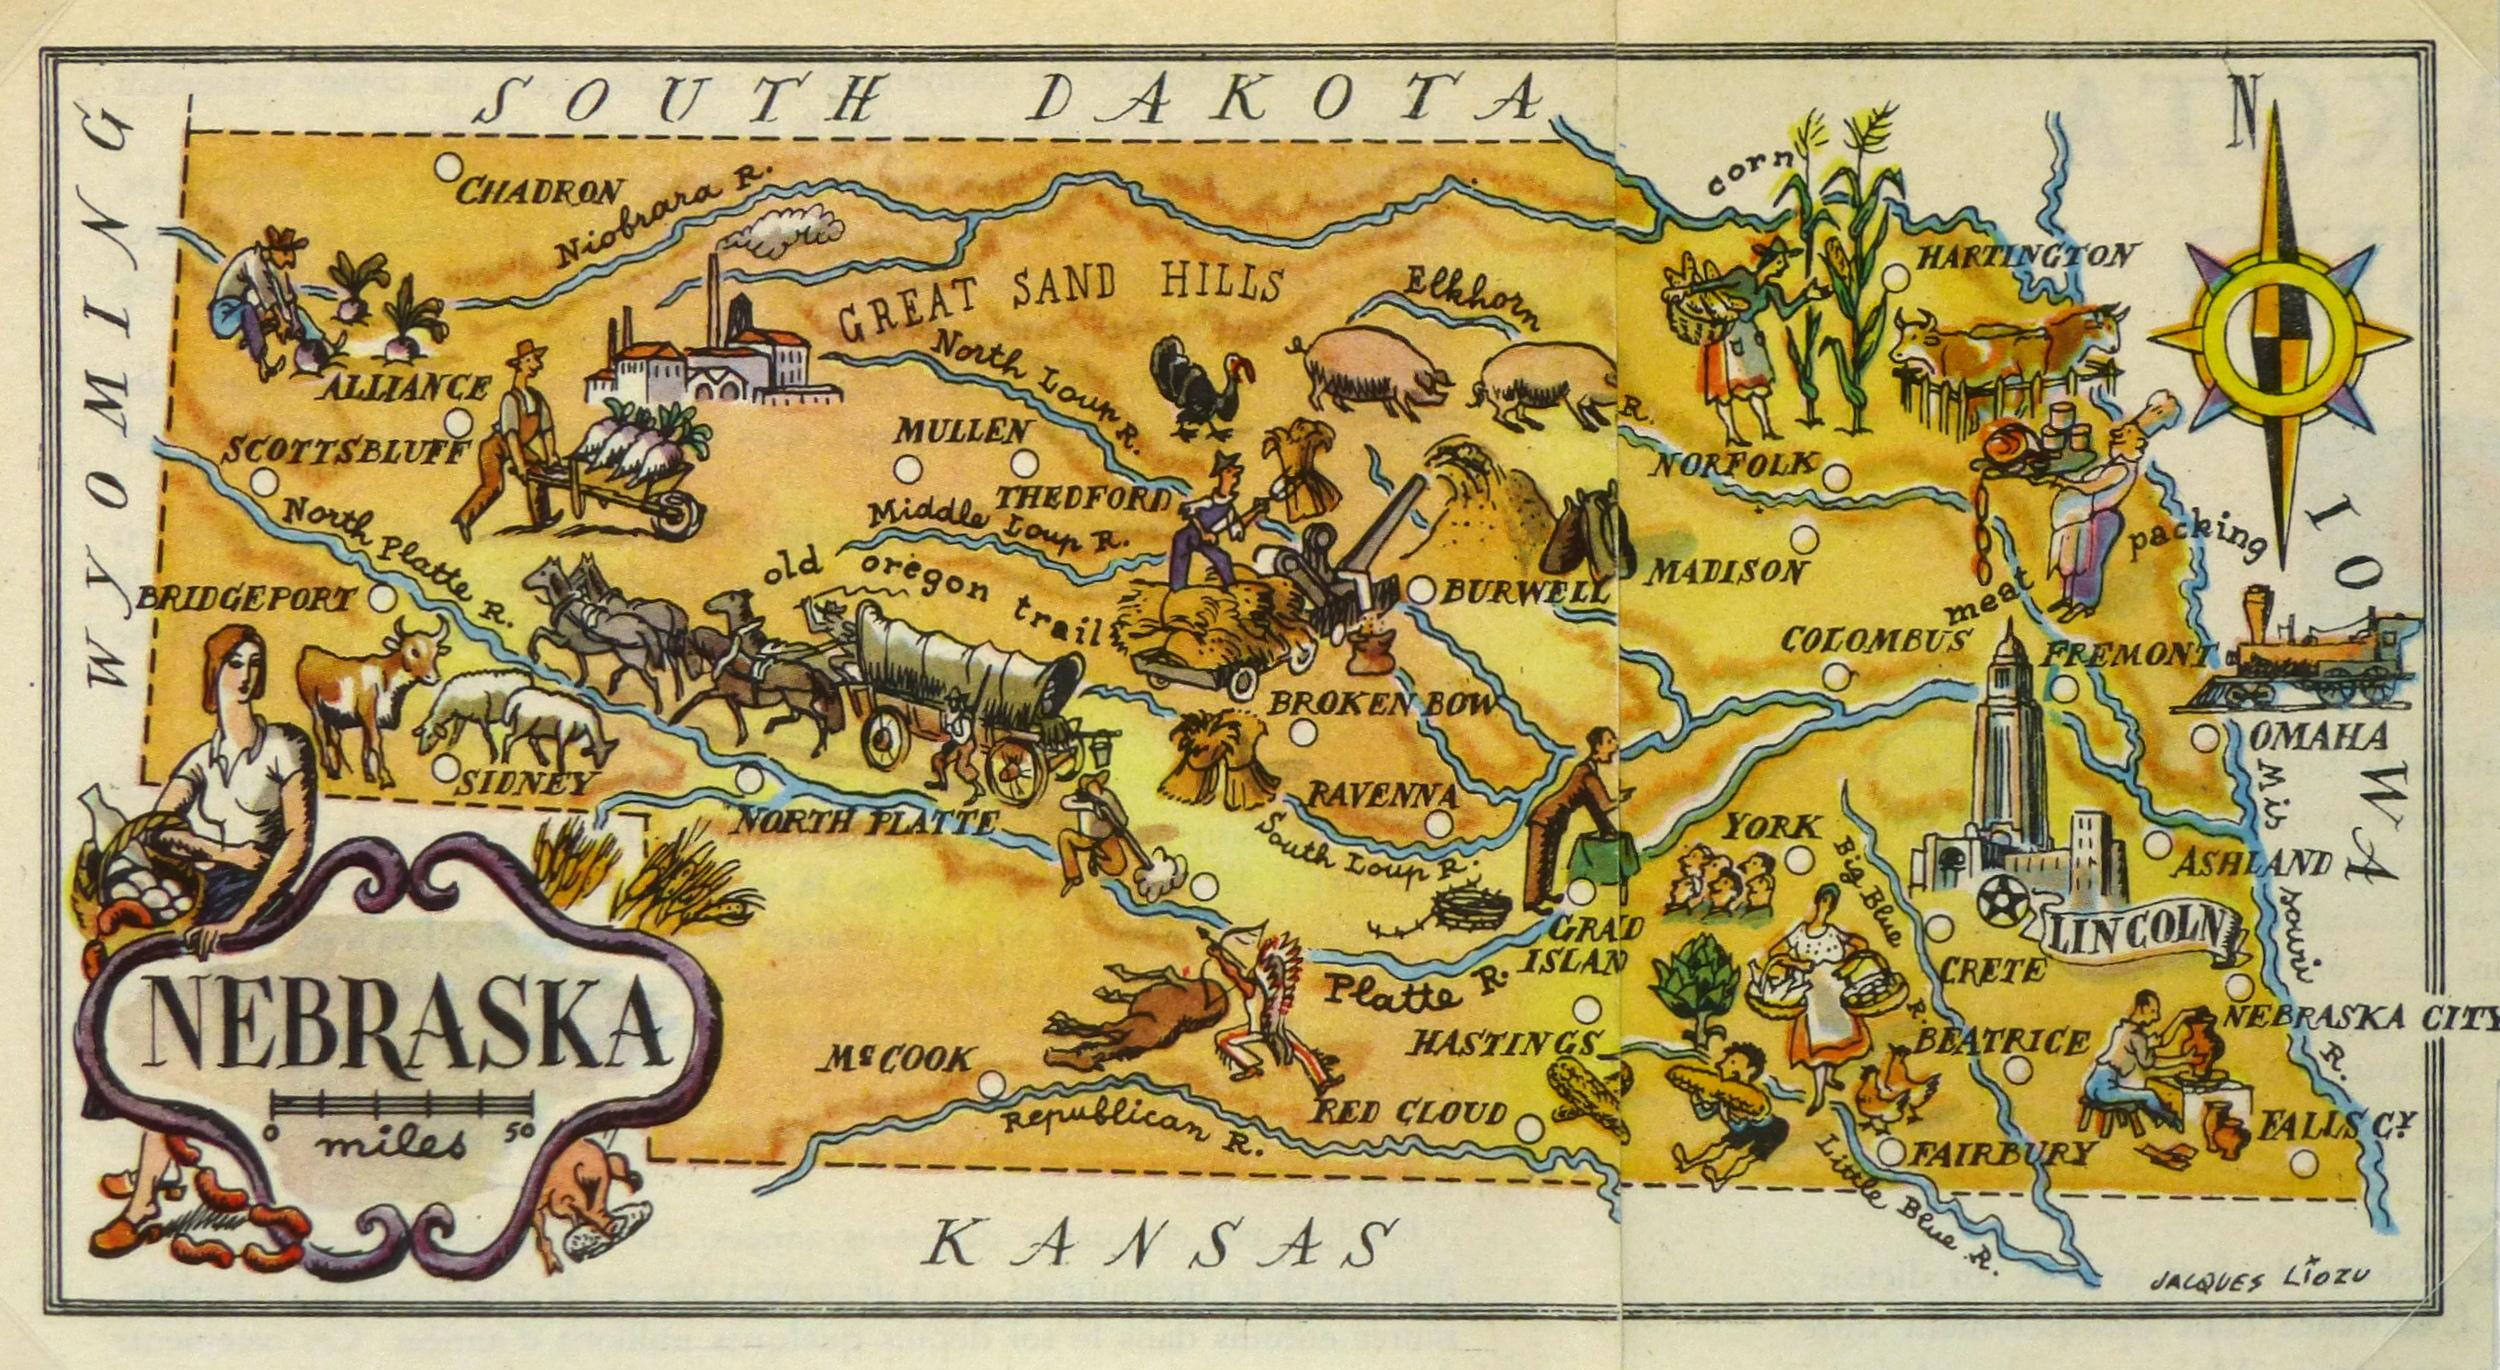 Nebraska Pictorial Map, 1946-main-6256K